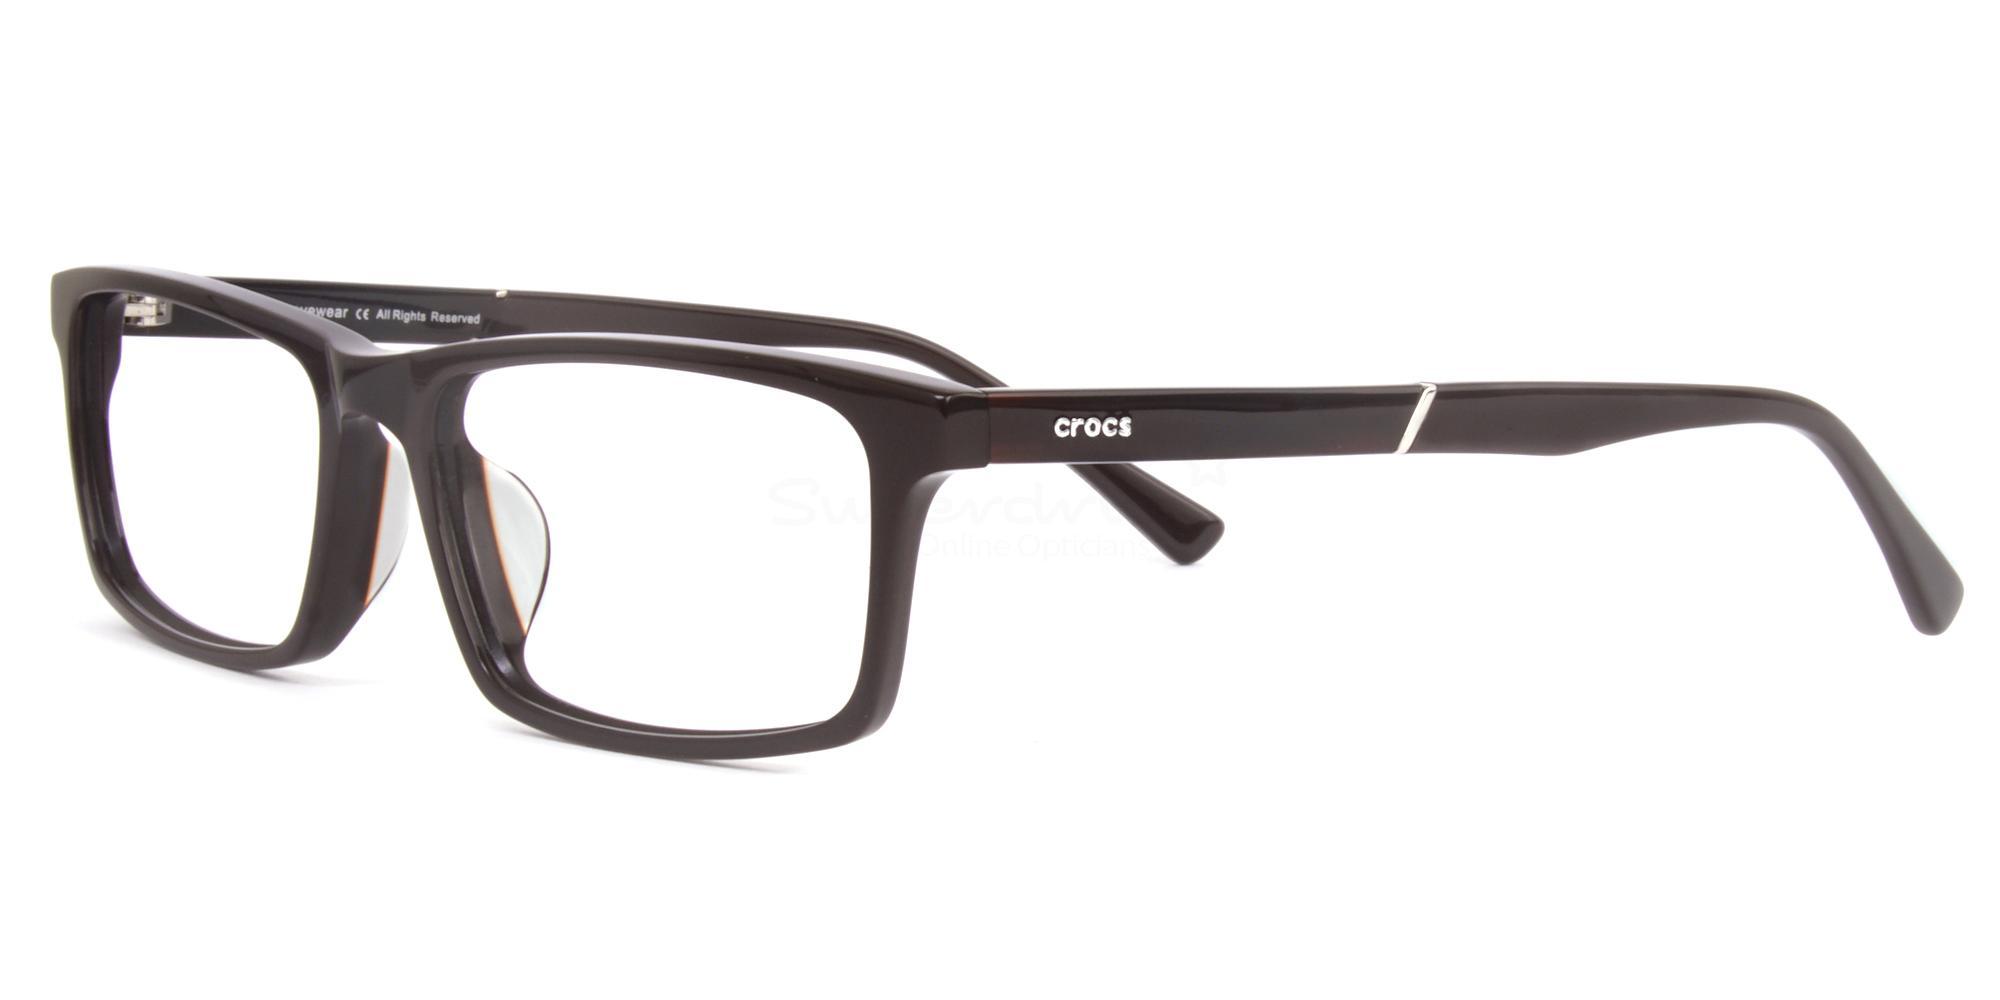 40BN CF4330 Glasses, Crocs Eyewear